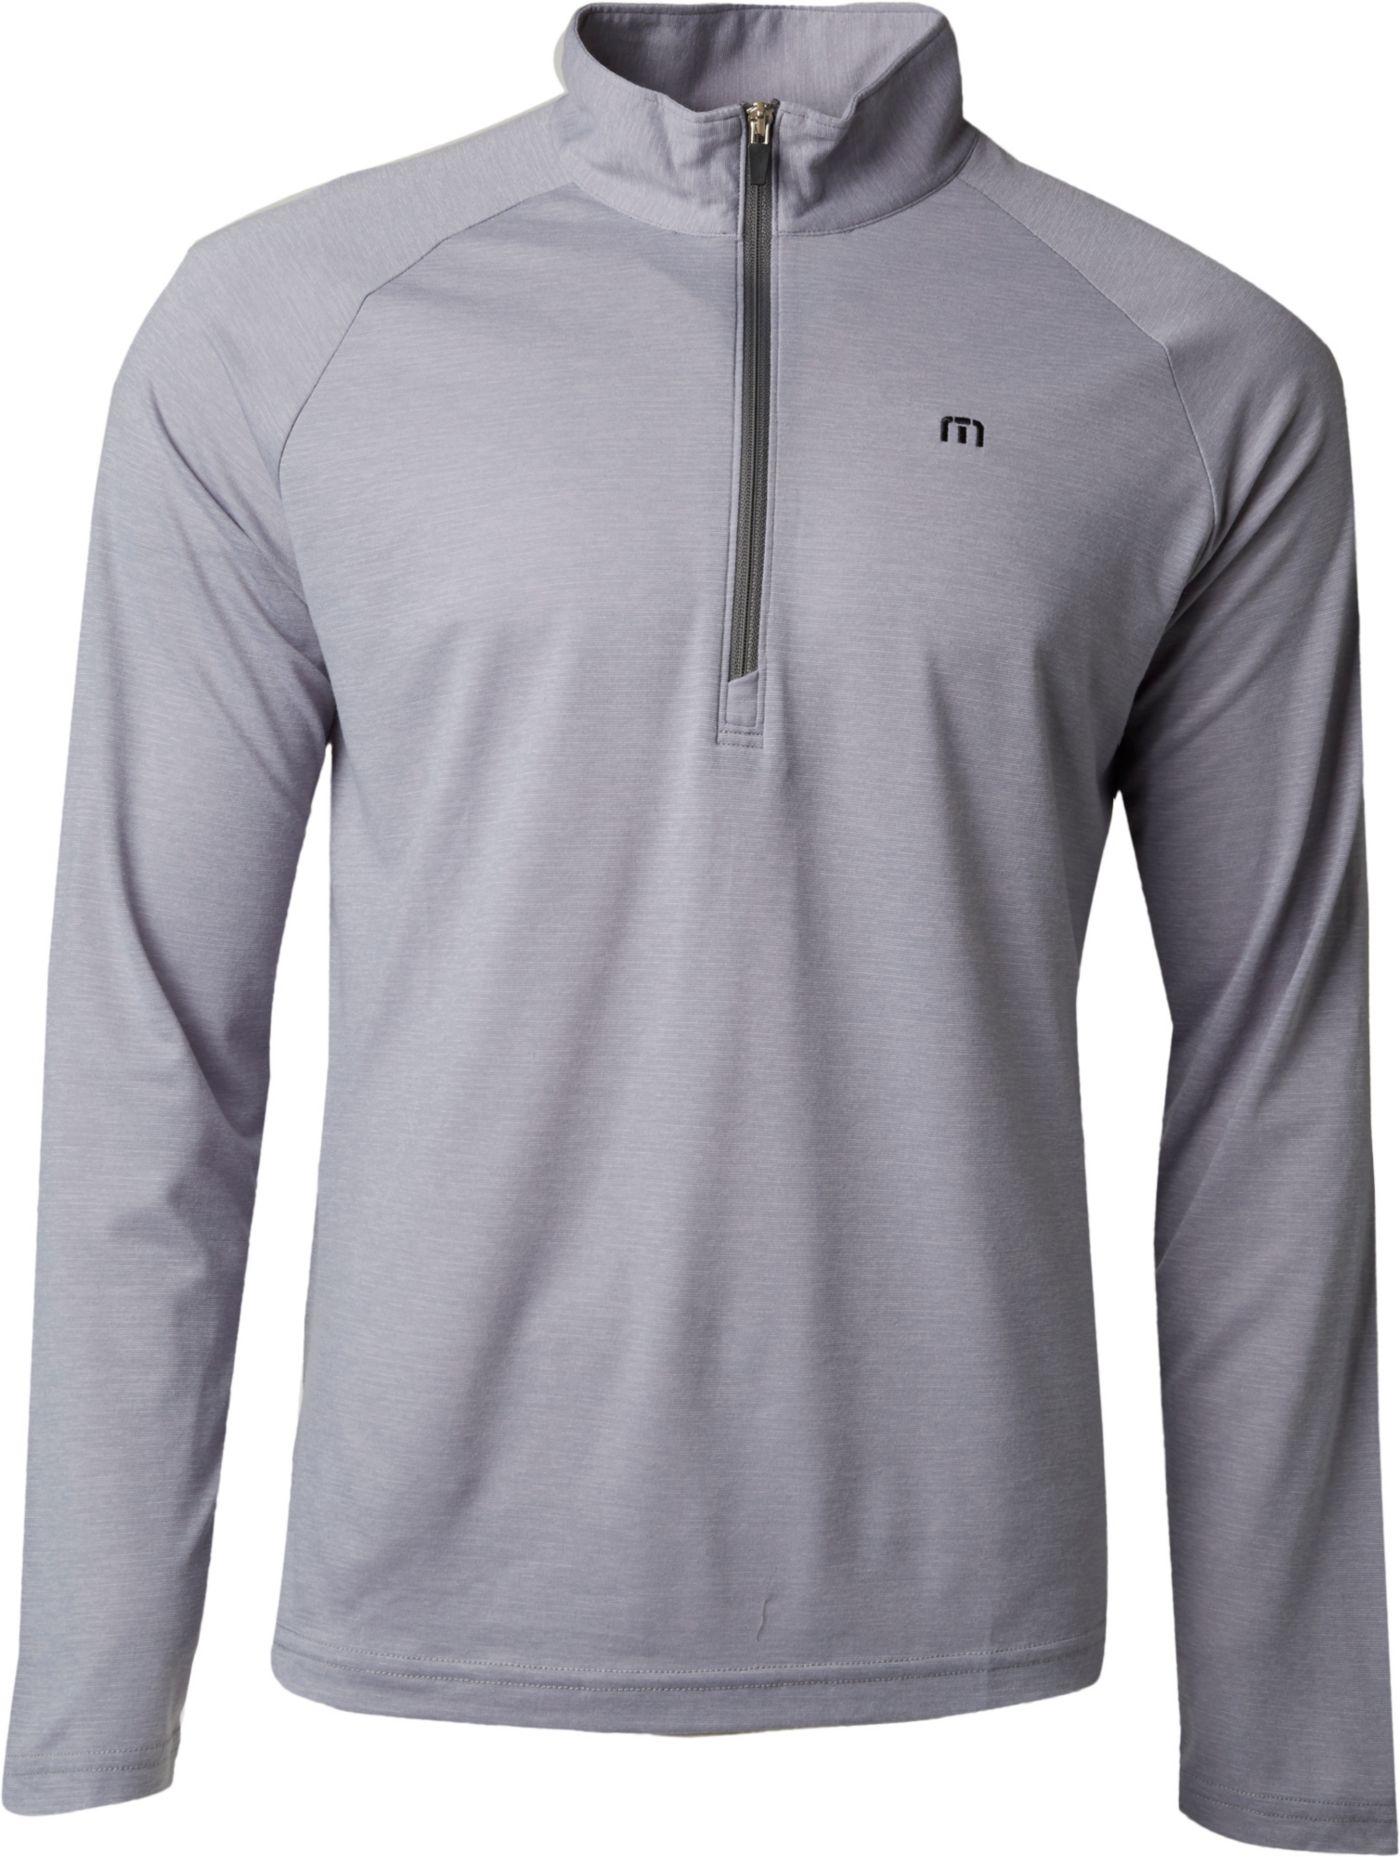 TravisMathew Men's Nobak ¼ Zip Golf Pullover